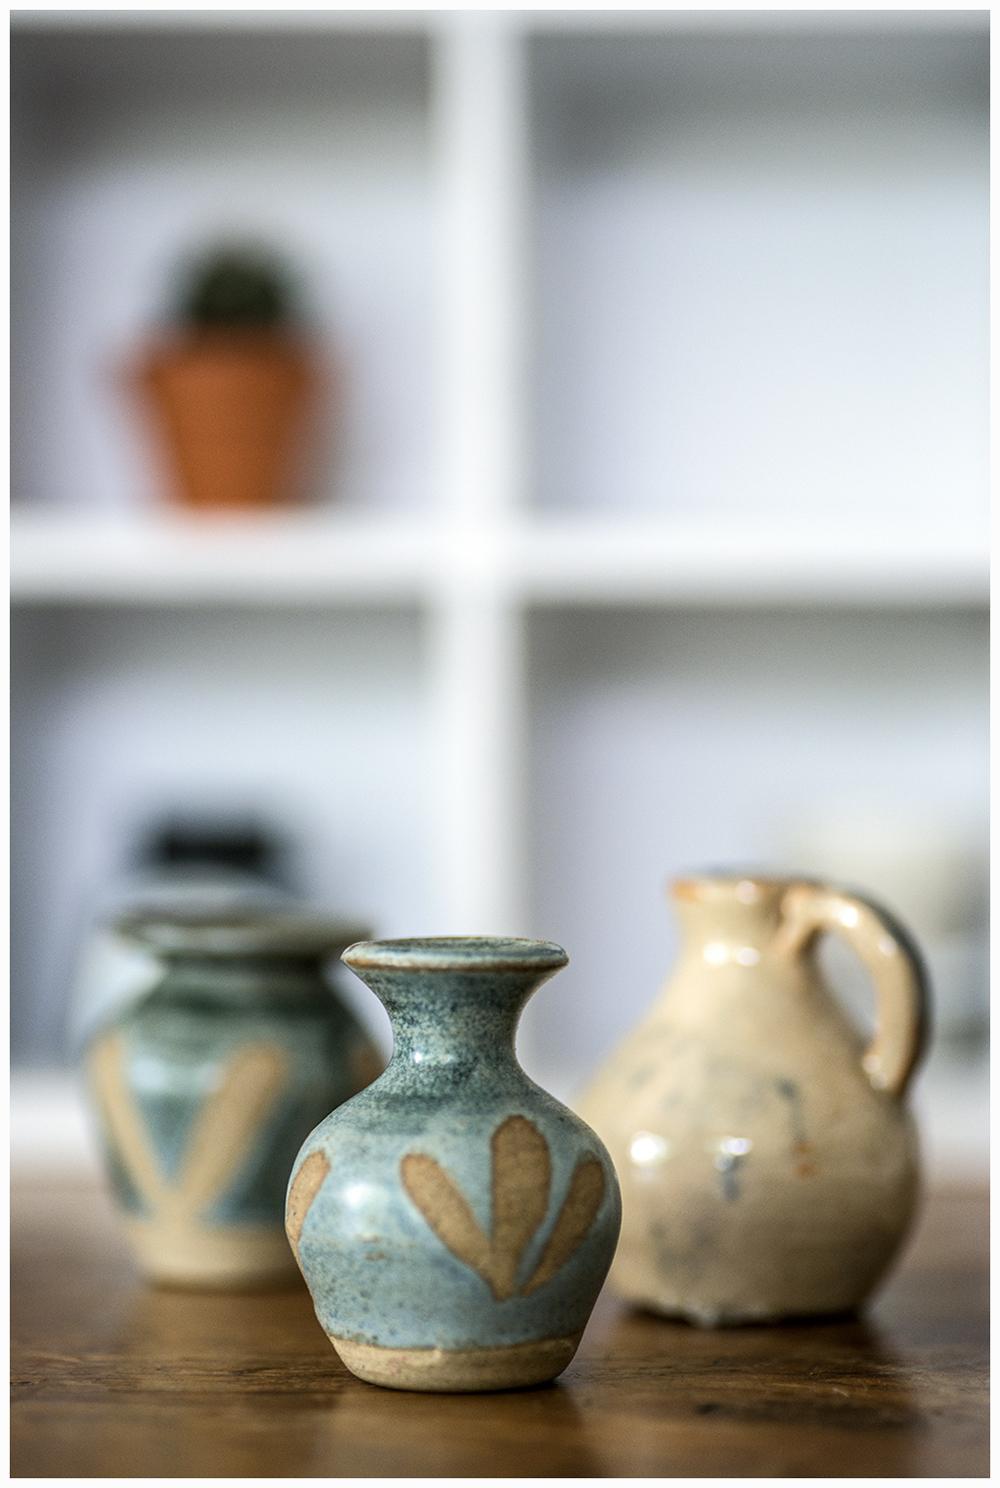 Miniature Pottery Vases